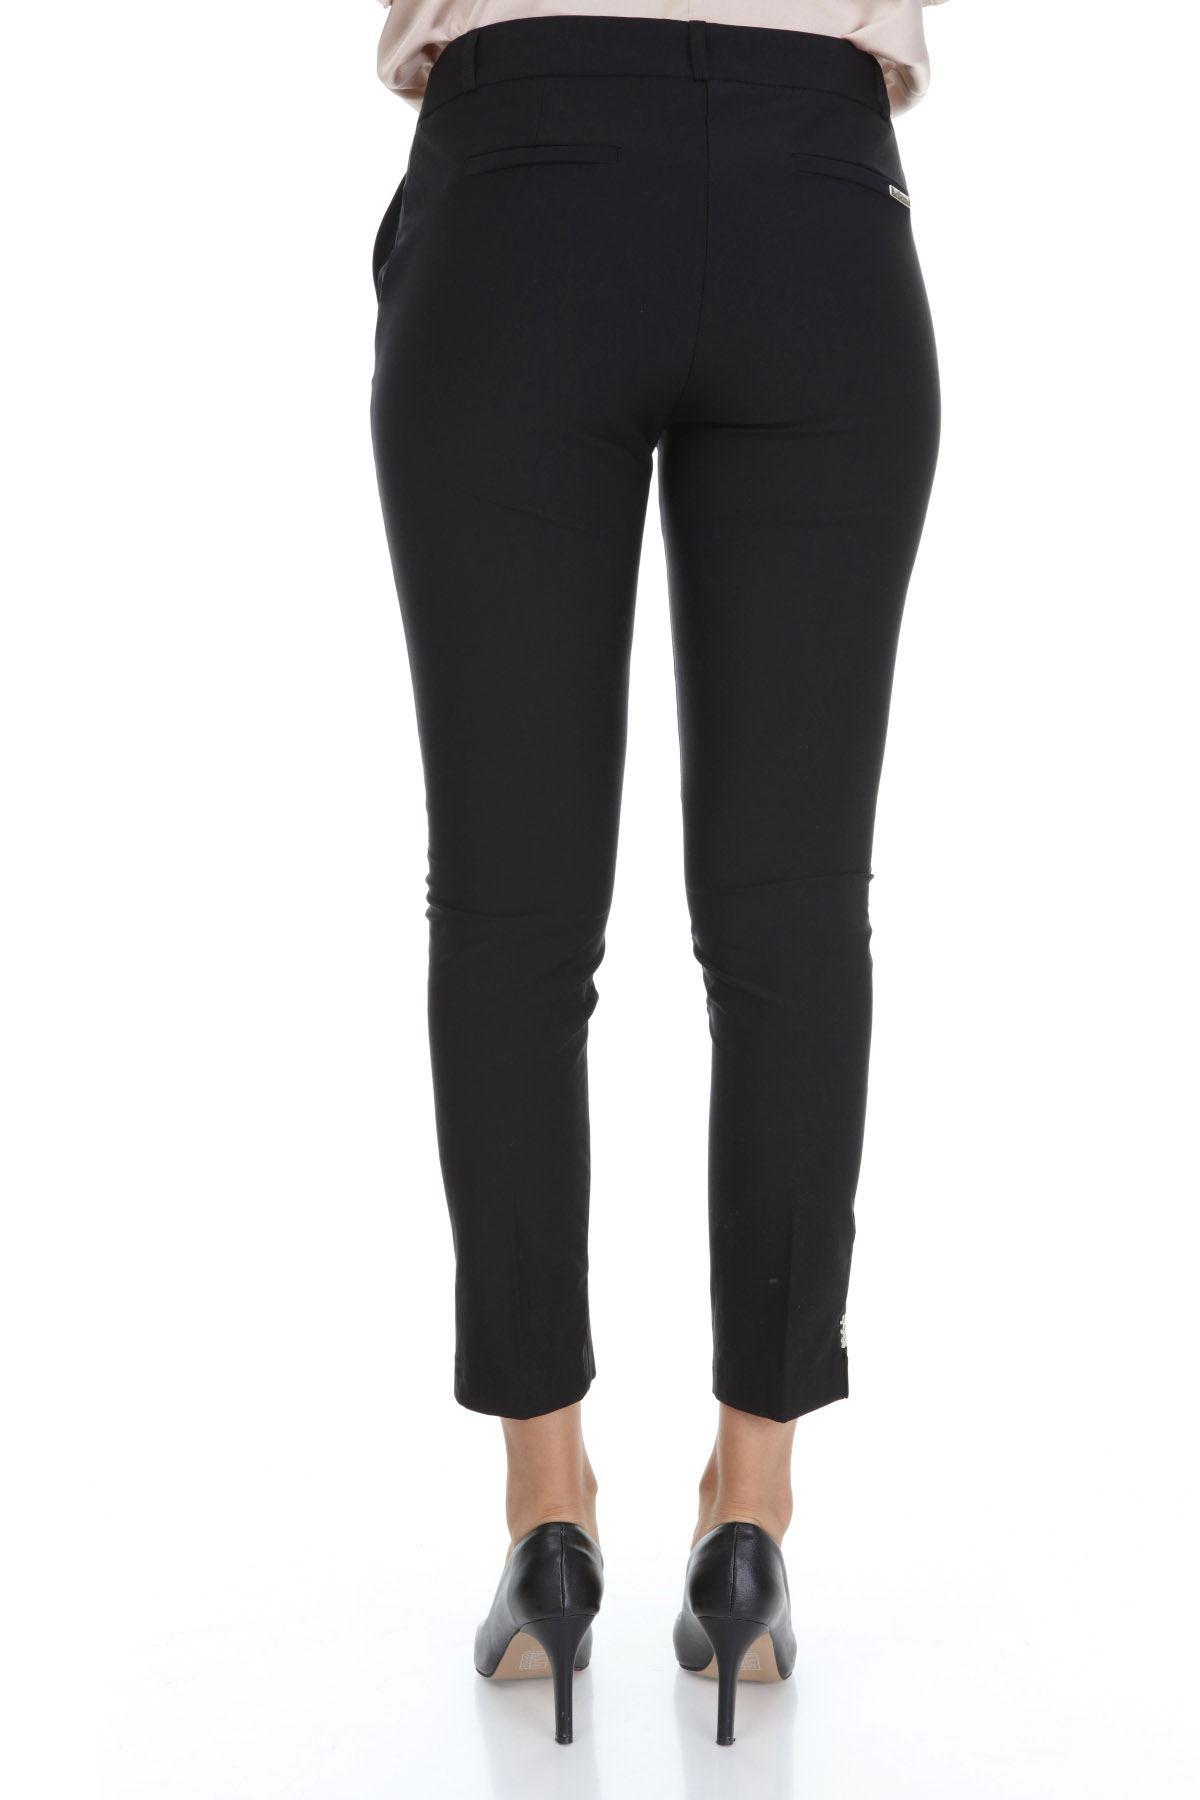 Siyah Büyük Beden Pantolon 30A-3547